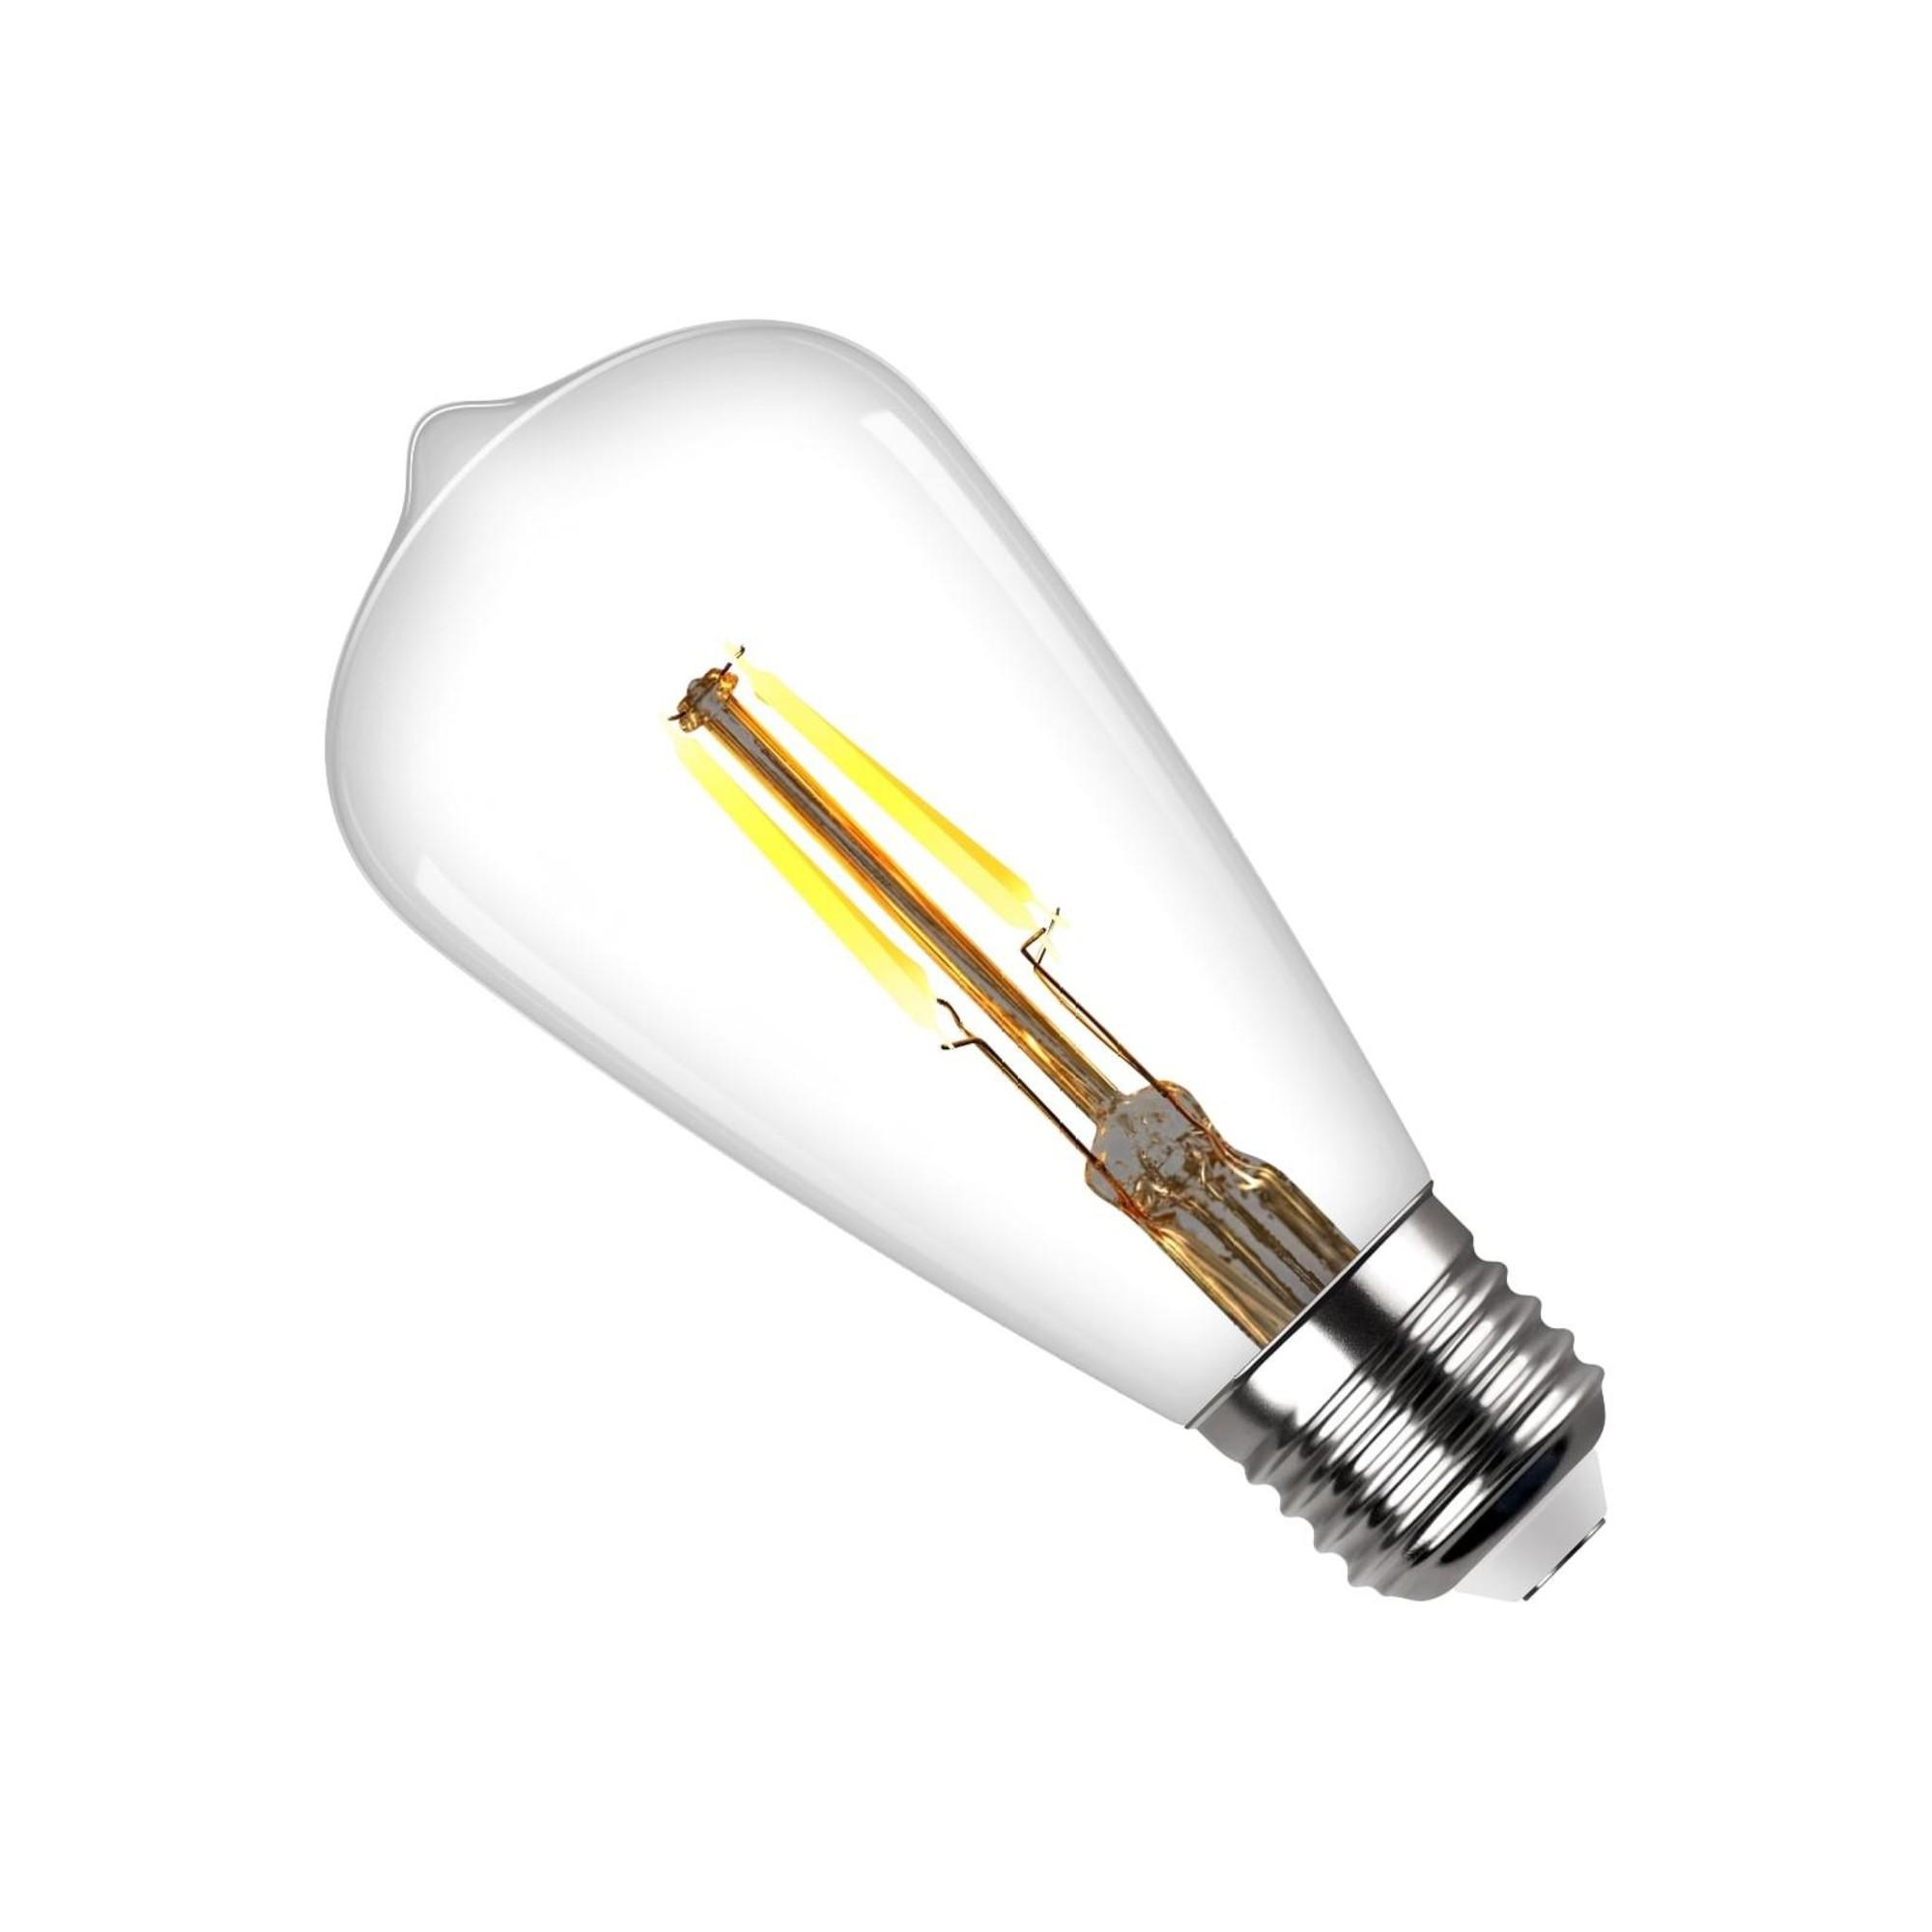 Лампа светодиодная (комплект 5 шт.) REV VINTAGE Filament ST64 E27 7W 2700K DECO Premium 32436 2